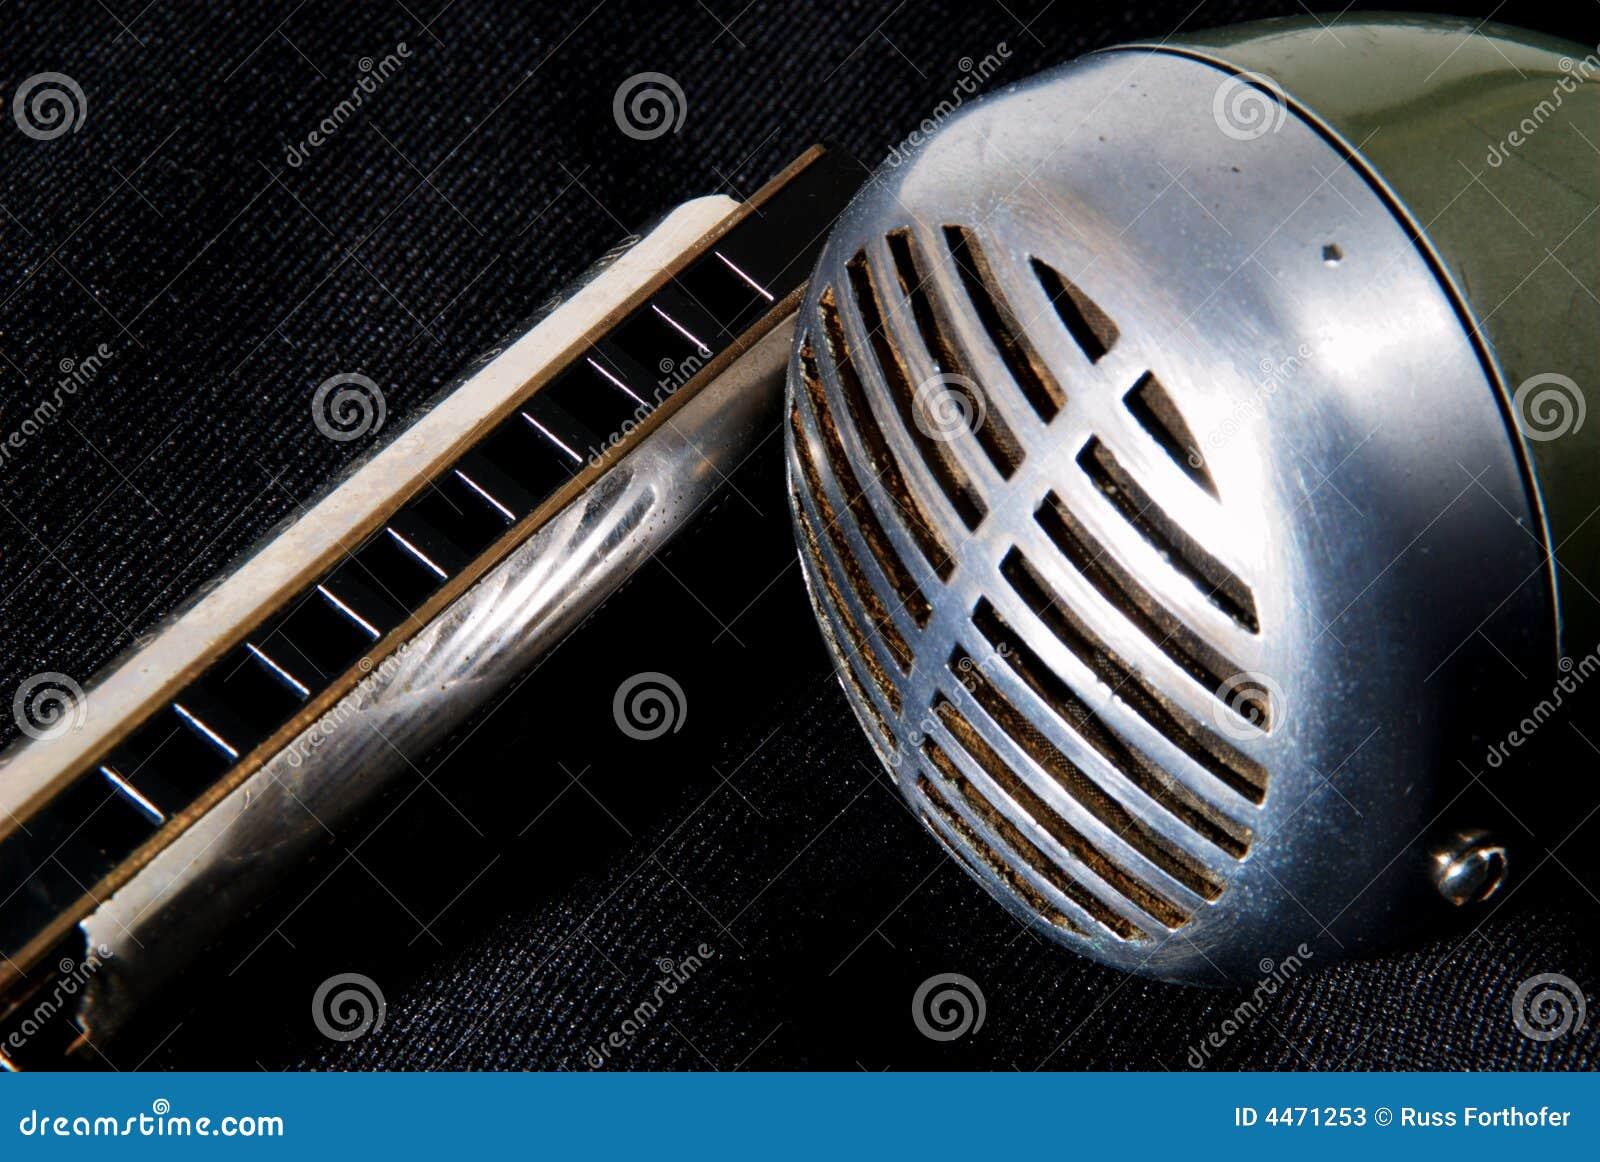 Blues harp and mic